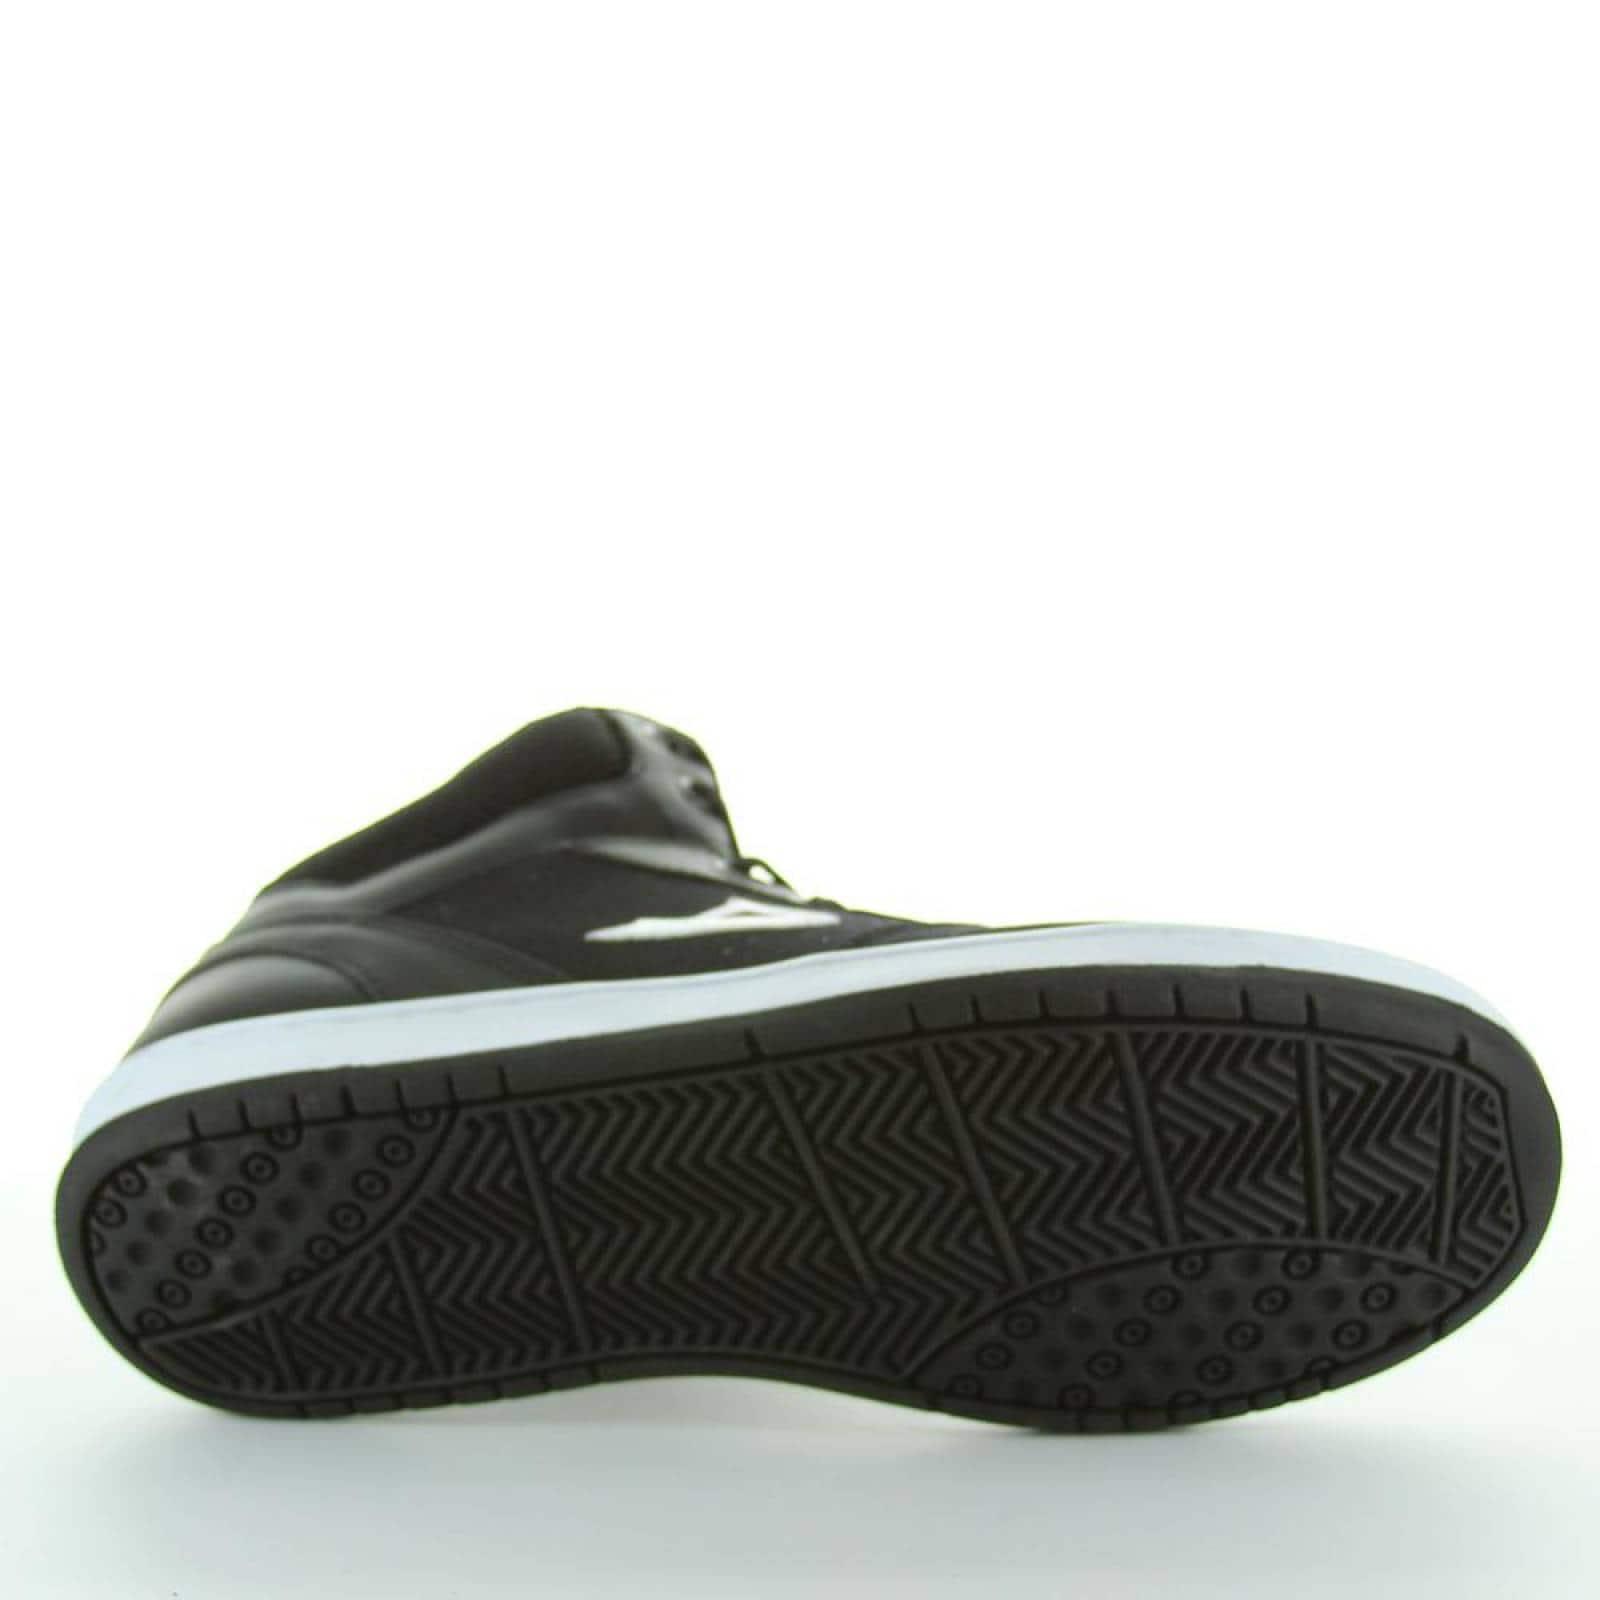 Tenis Dhila Hombre Negro Textil 494